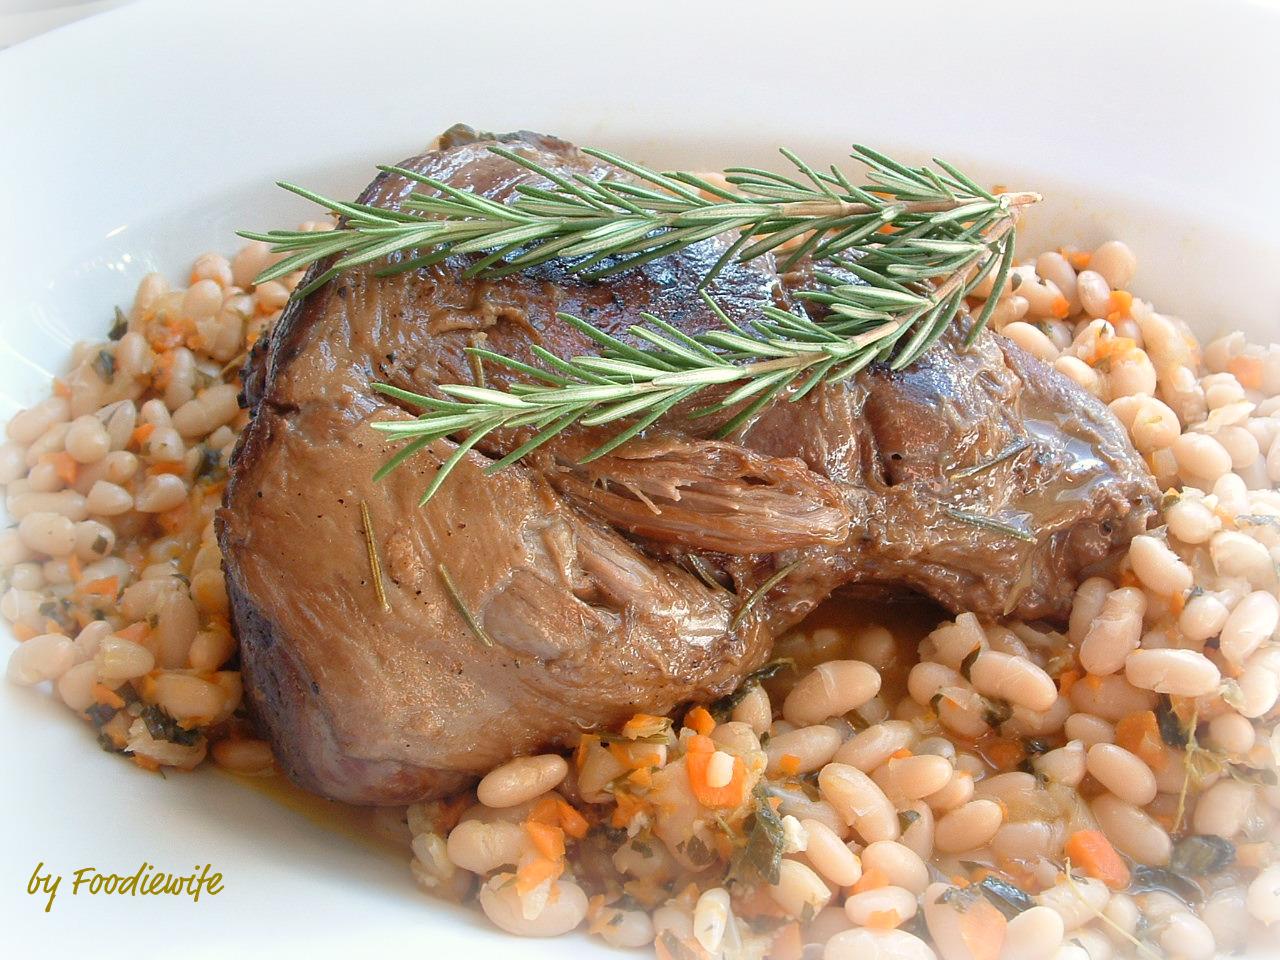 ina gartens braised 4 hour lamb provencal french beans - Ina Garten Lamb Recipes